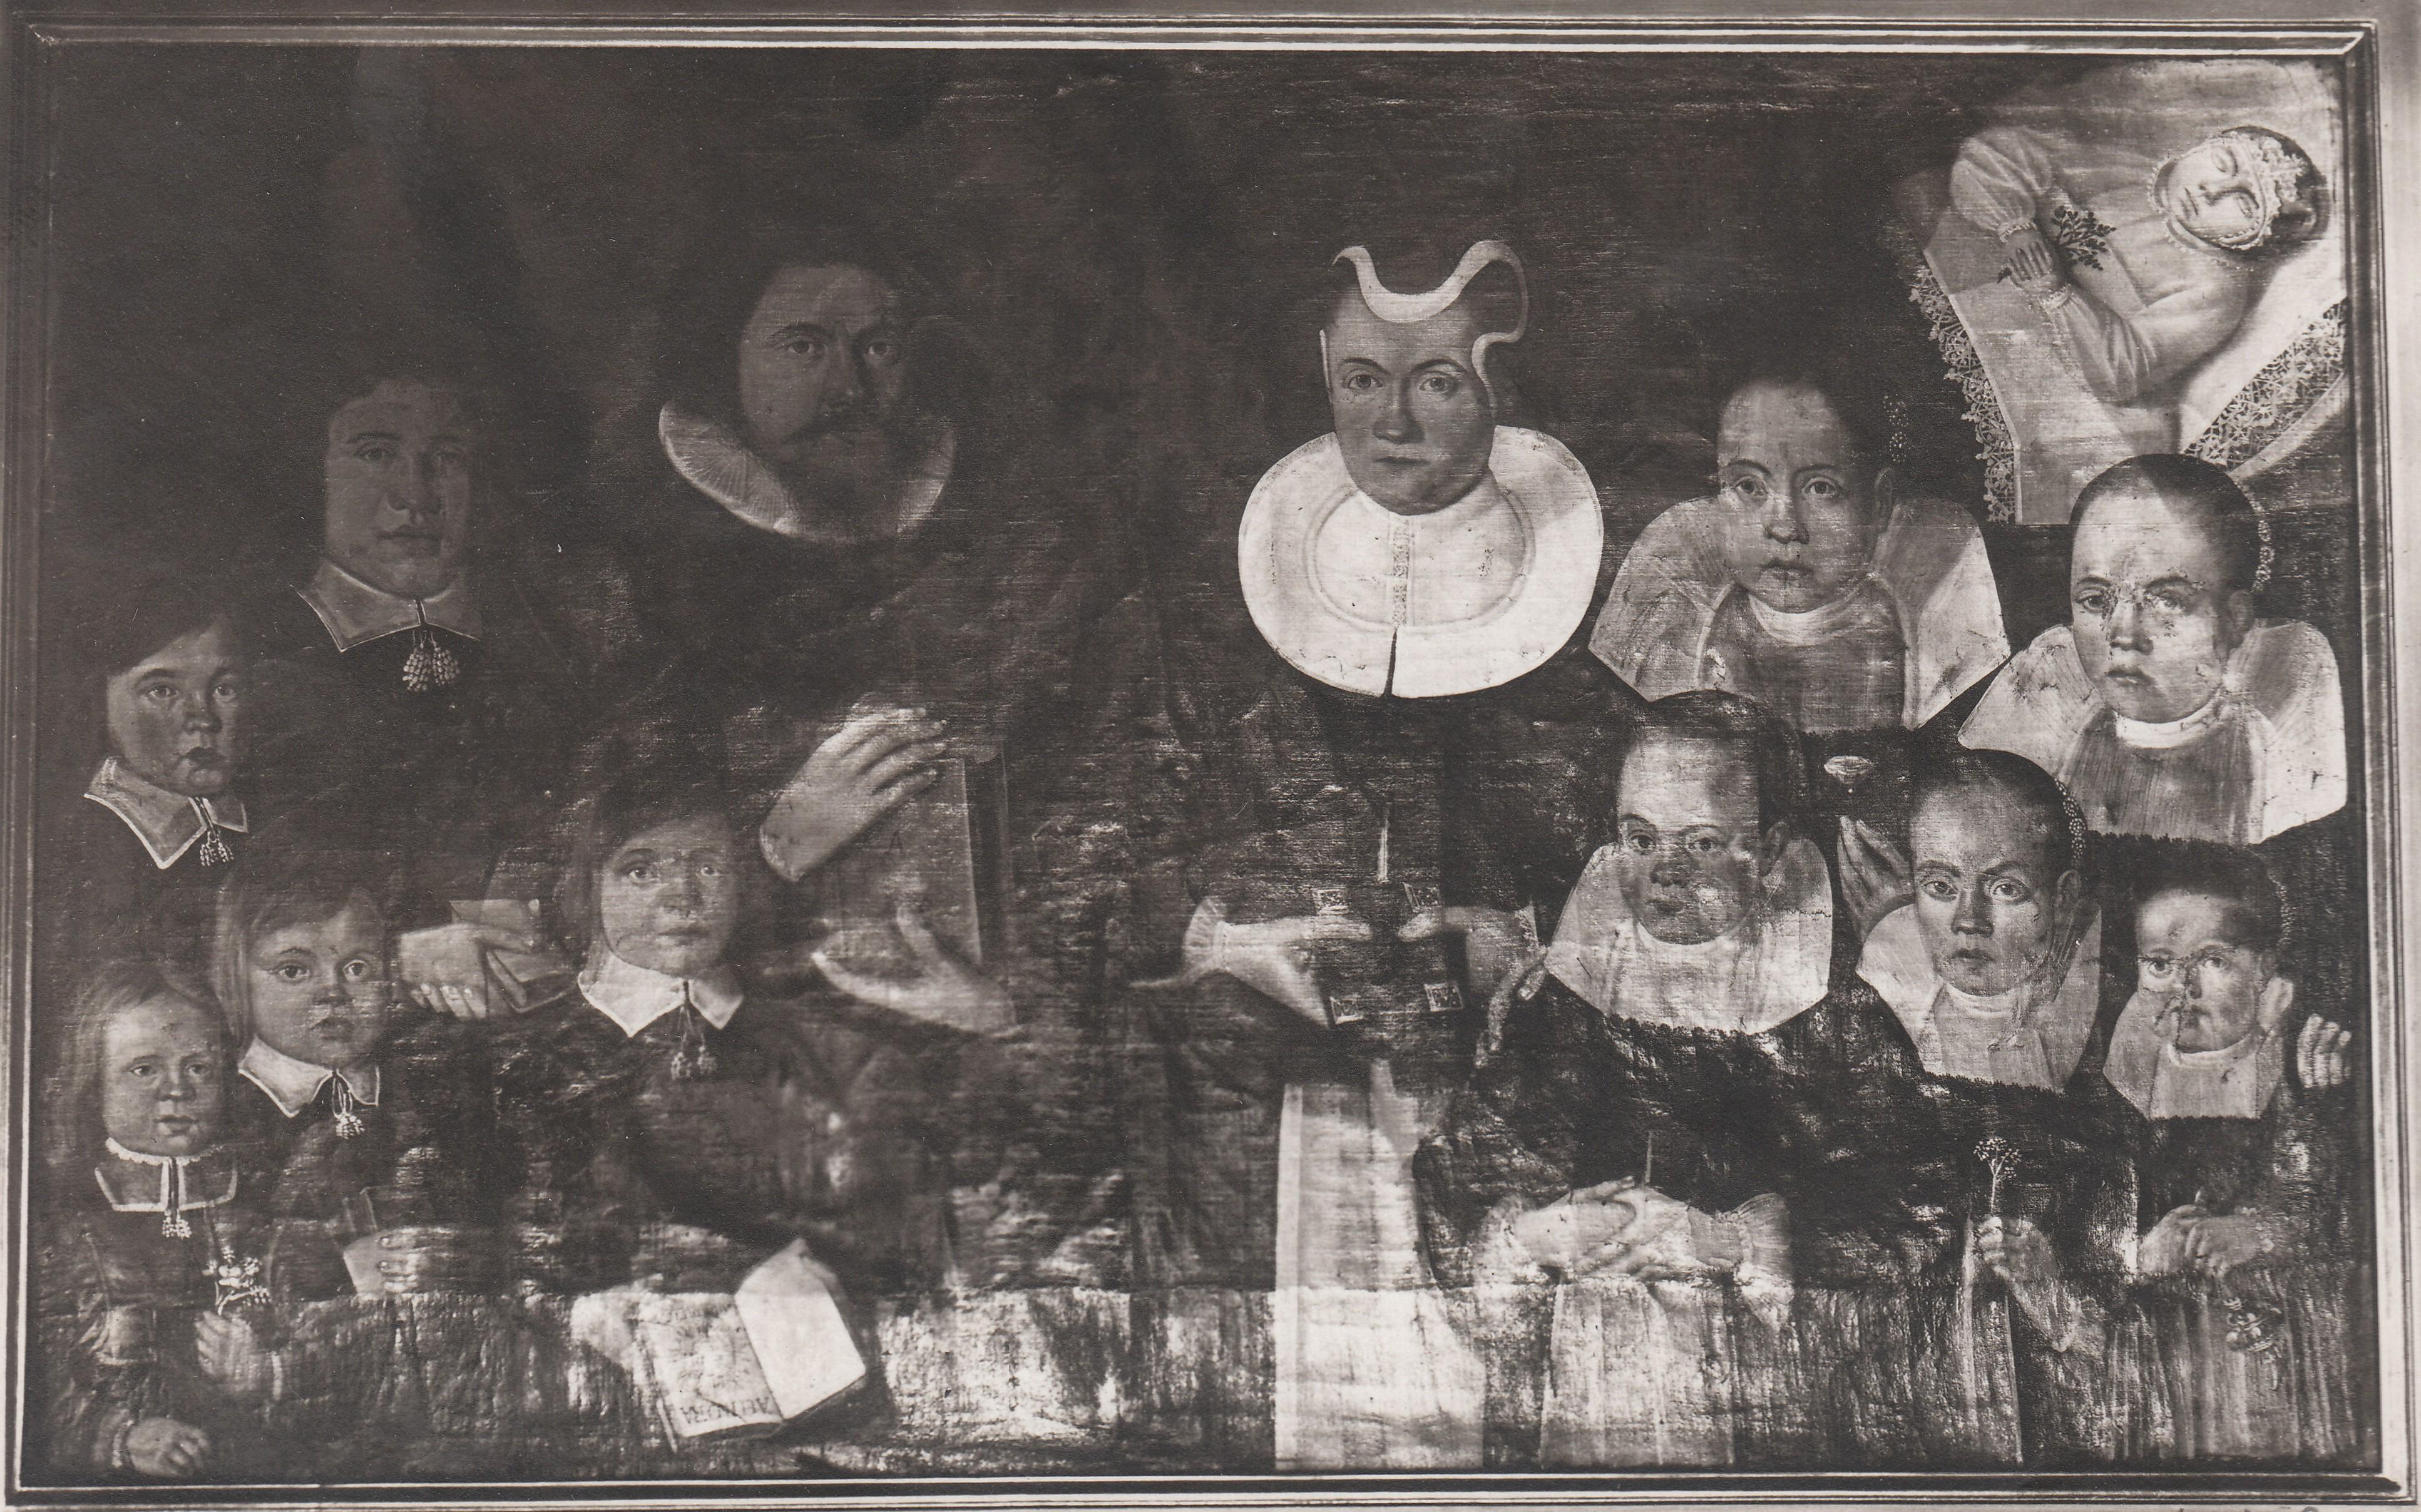 File:Anders Roaldsen (1606 - 1662) og hans kone Lucie Eriksdatter Blix (